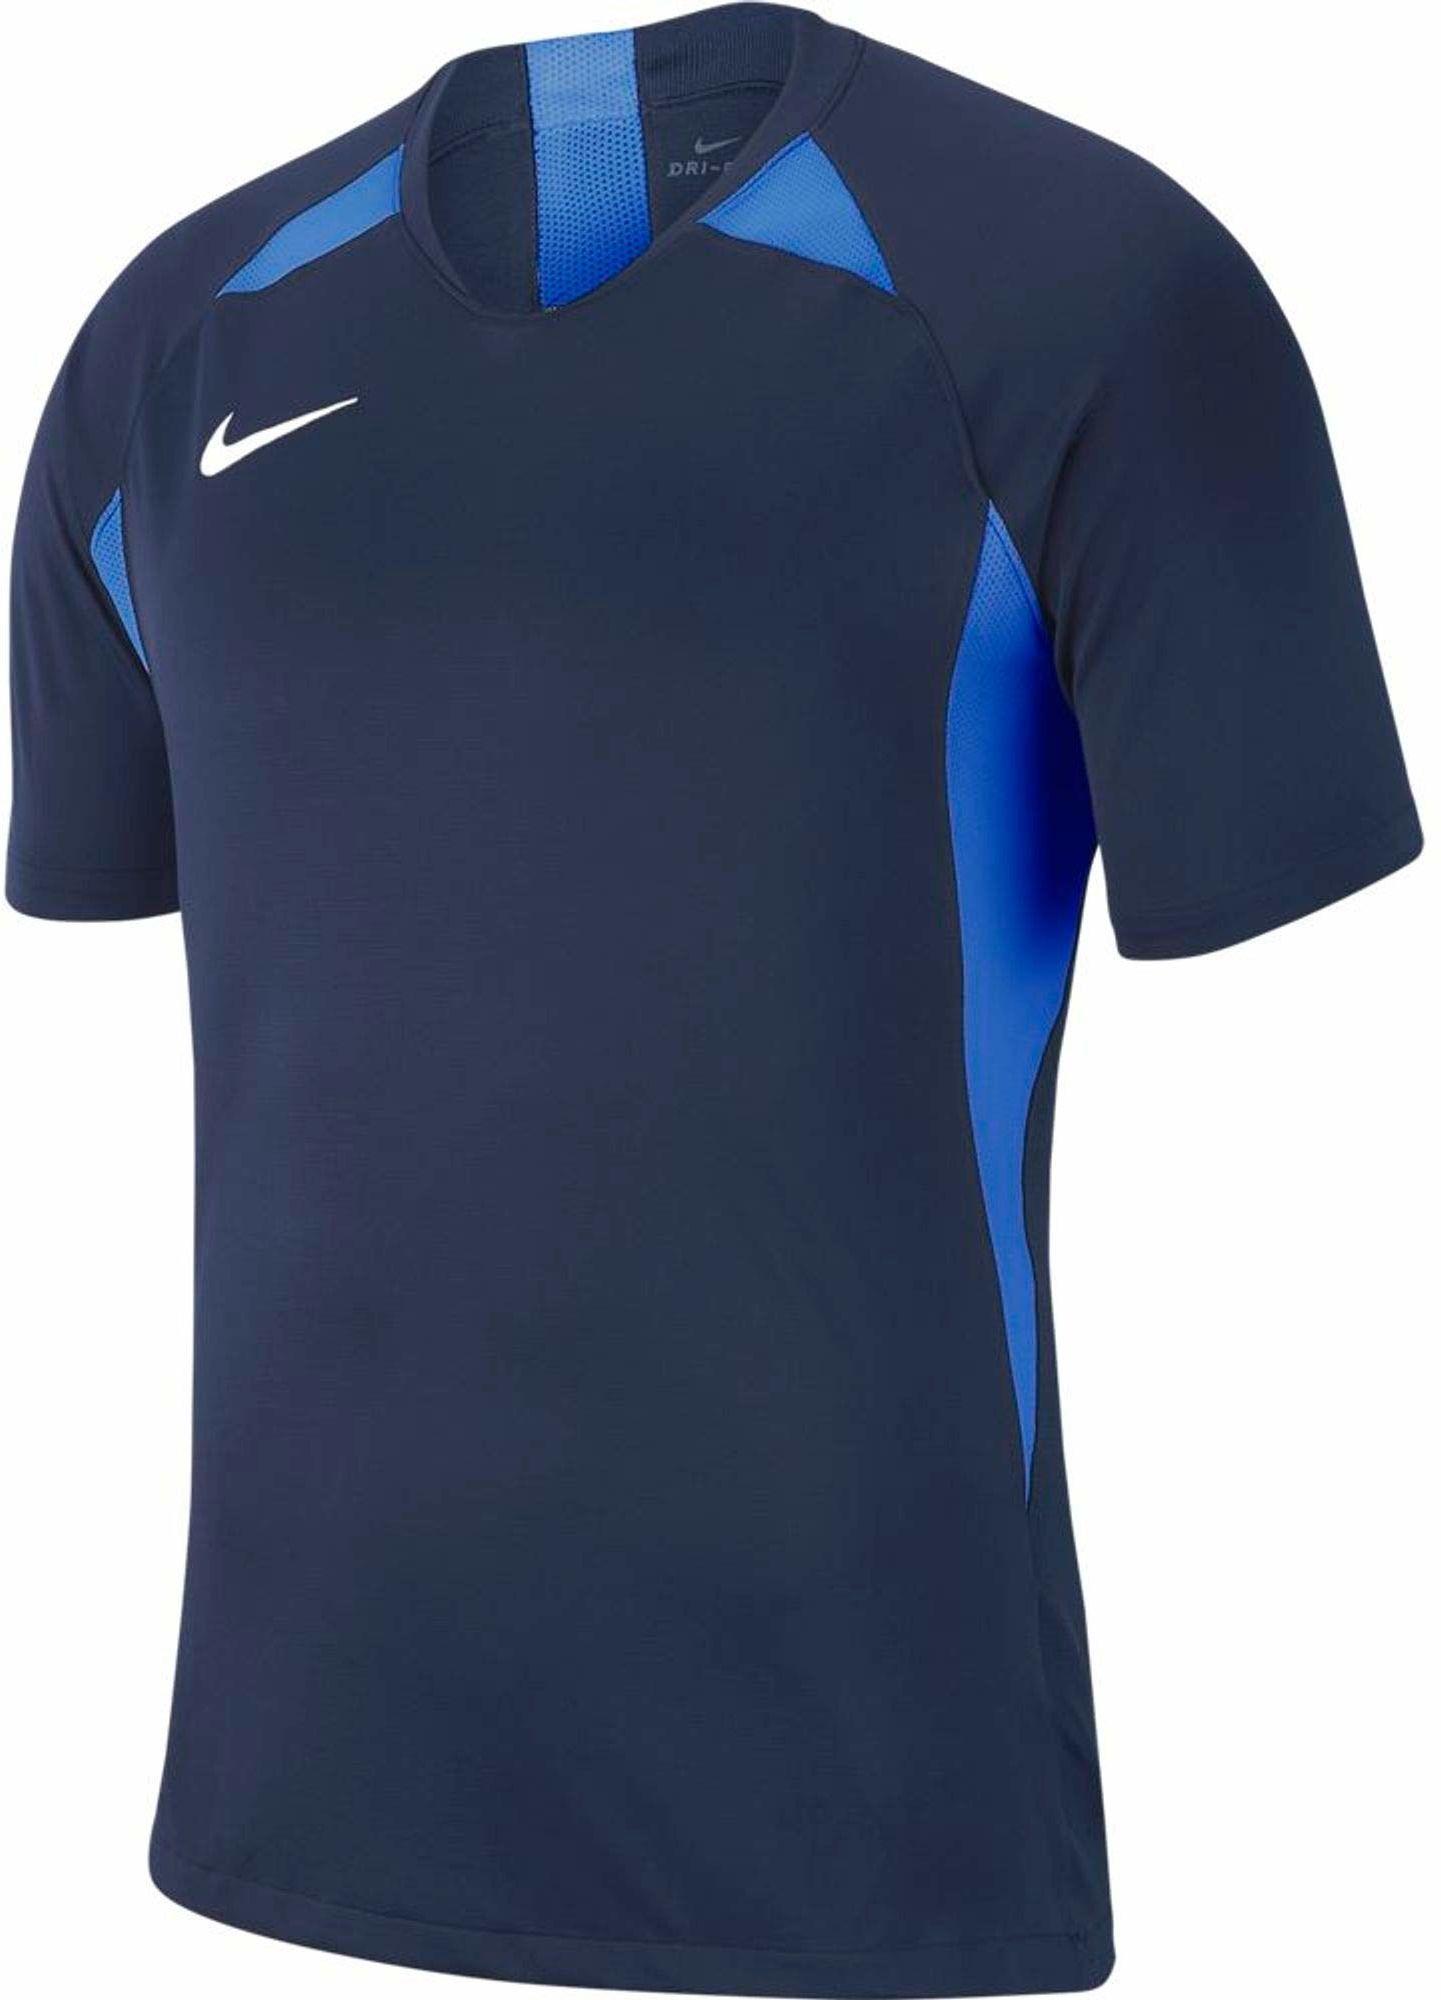 Nike uniseks koszulka legendowa dla dzieci S/S Jersey Midnight Navy/Royal Blue/White S